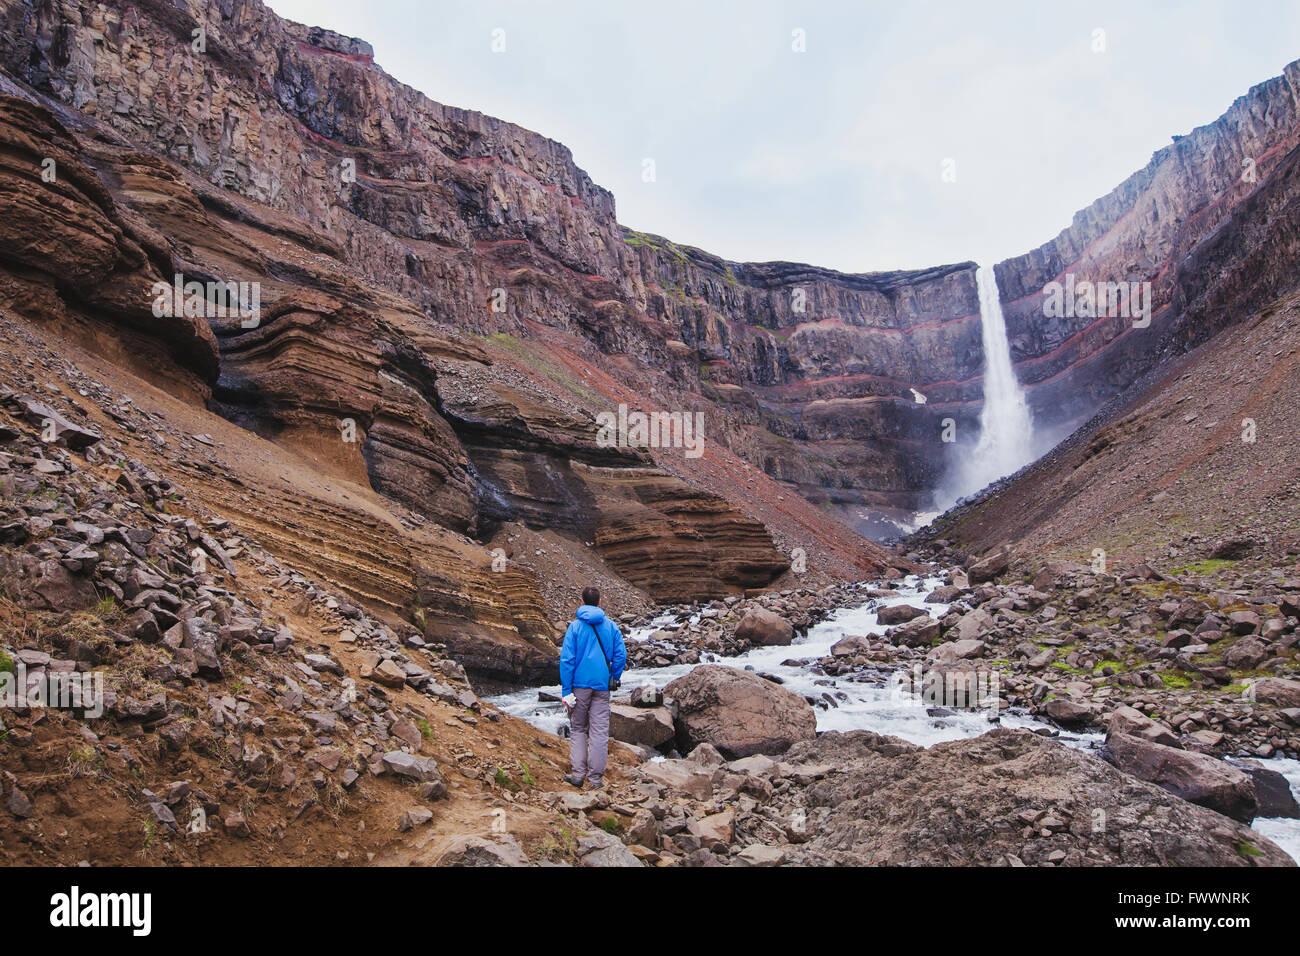 Wanderer zu Fuß zum Hengifoss Wasserfall in Island, schöne Landschaft Stockbild